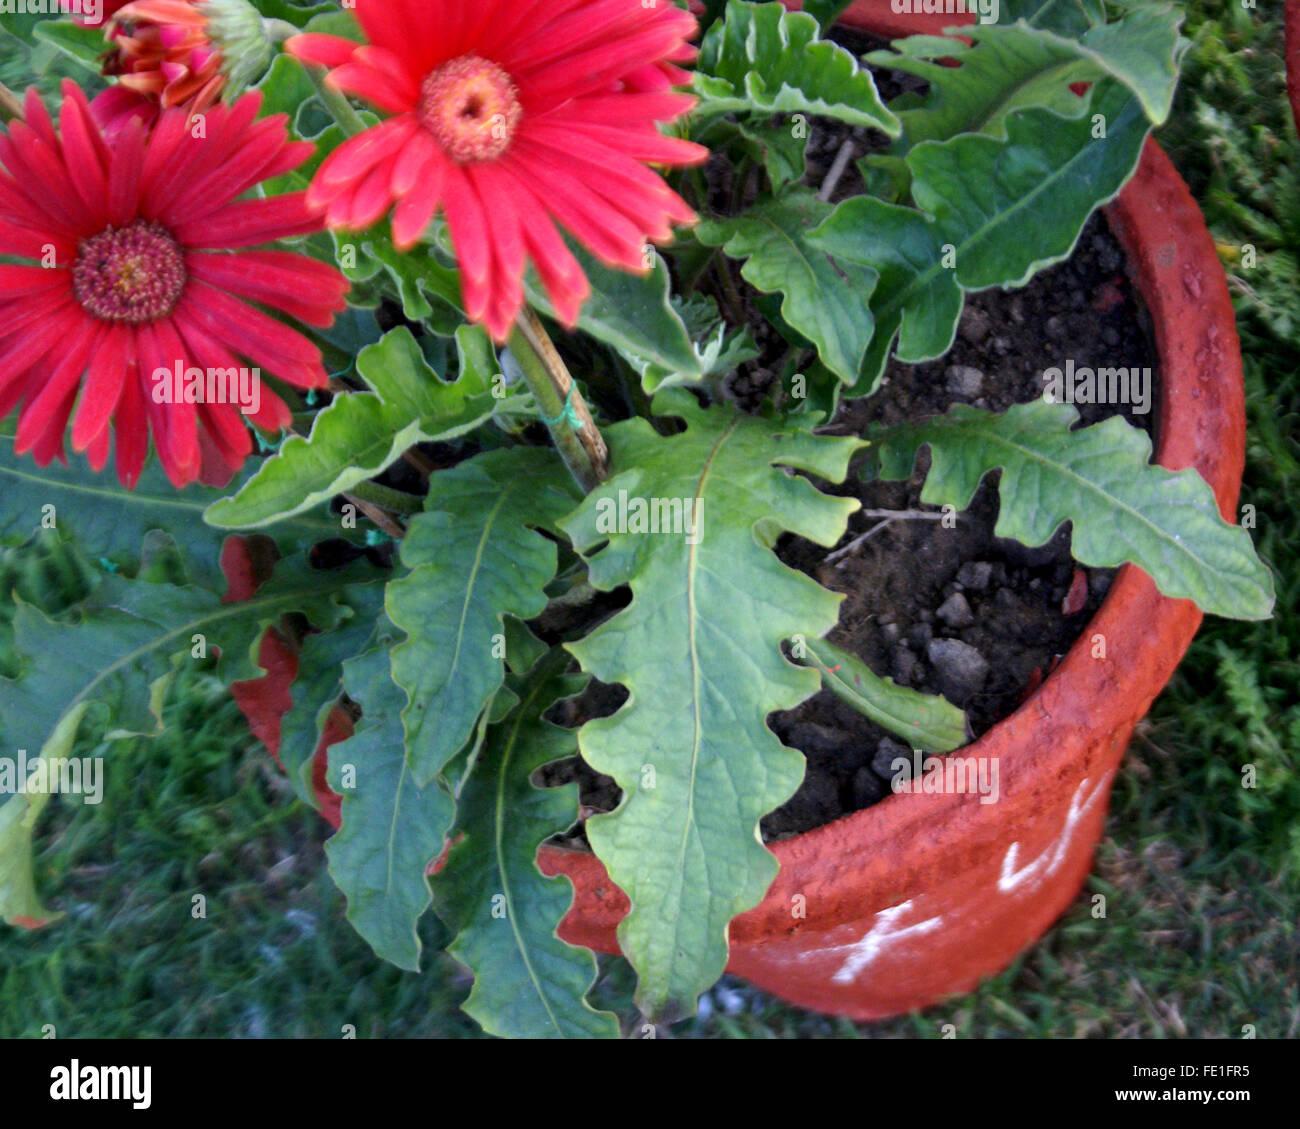 Gerbera jamesonii, Transvaal daisy, perennial ornamental herb with basal rosette of lobed leaves, radiate flower - Stock Image